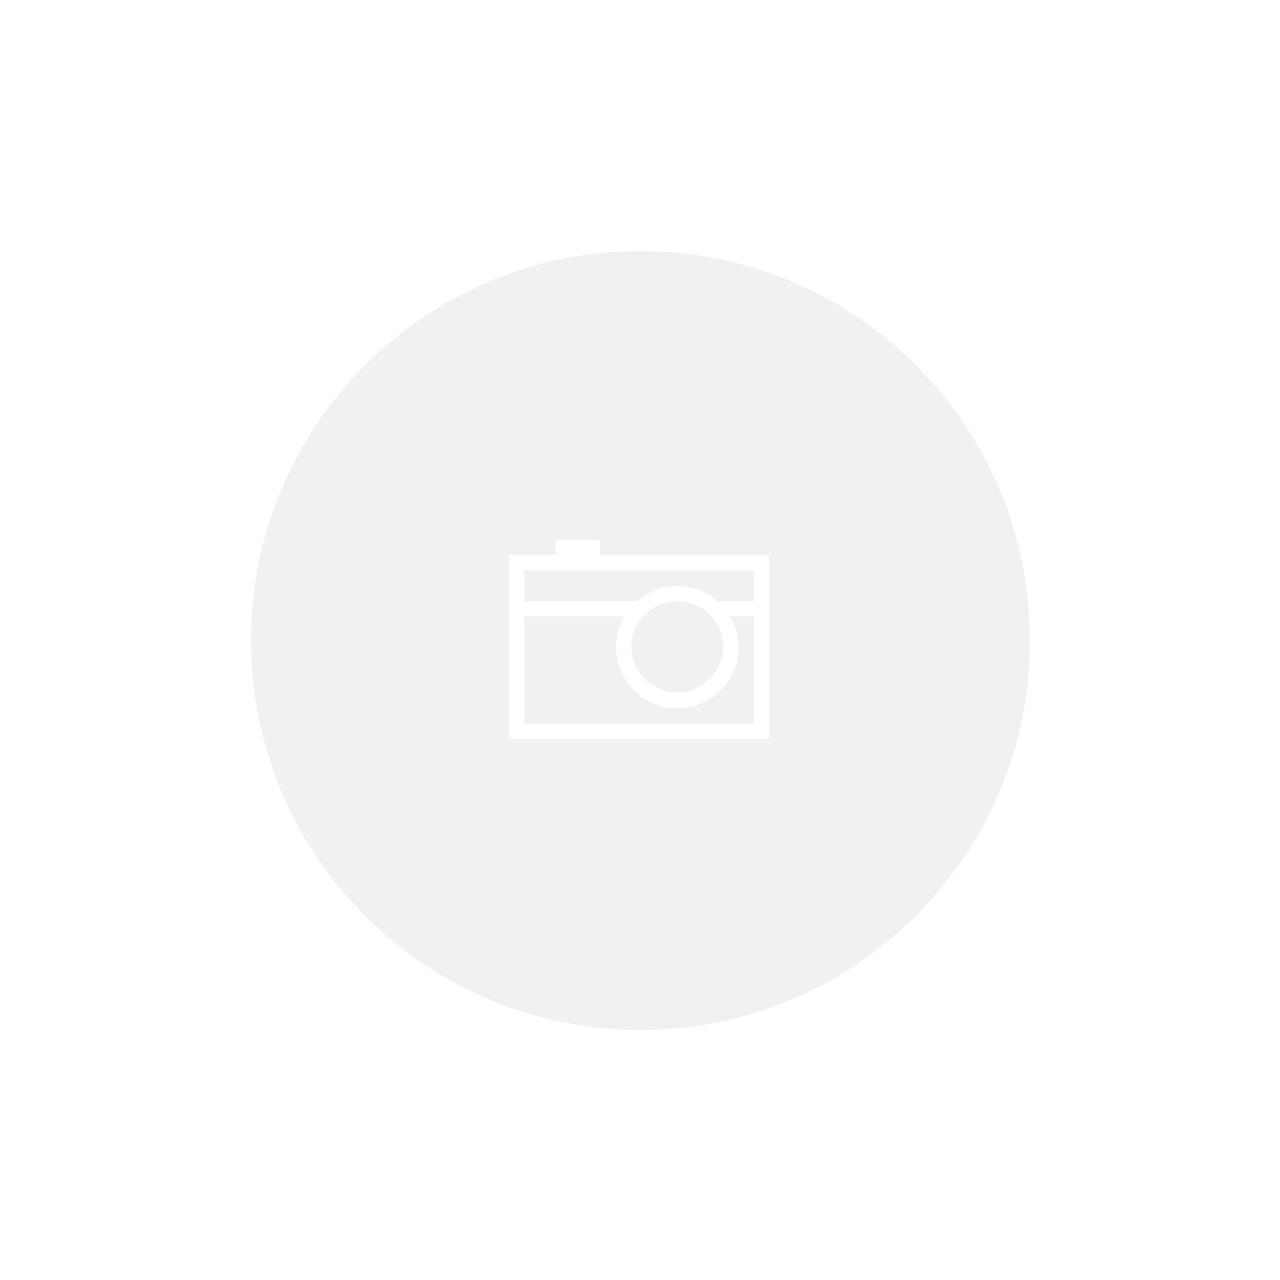 COROA 36D ICTUS NARROW WIDE BCD 94/96mm 4 FUROS (12V)